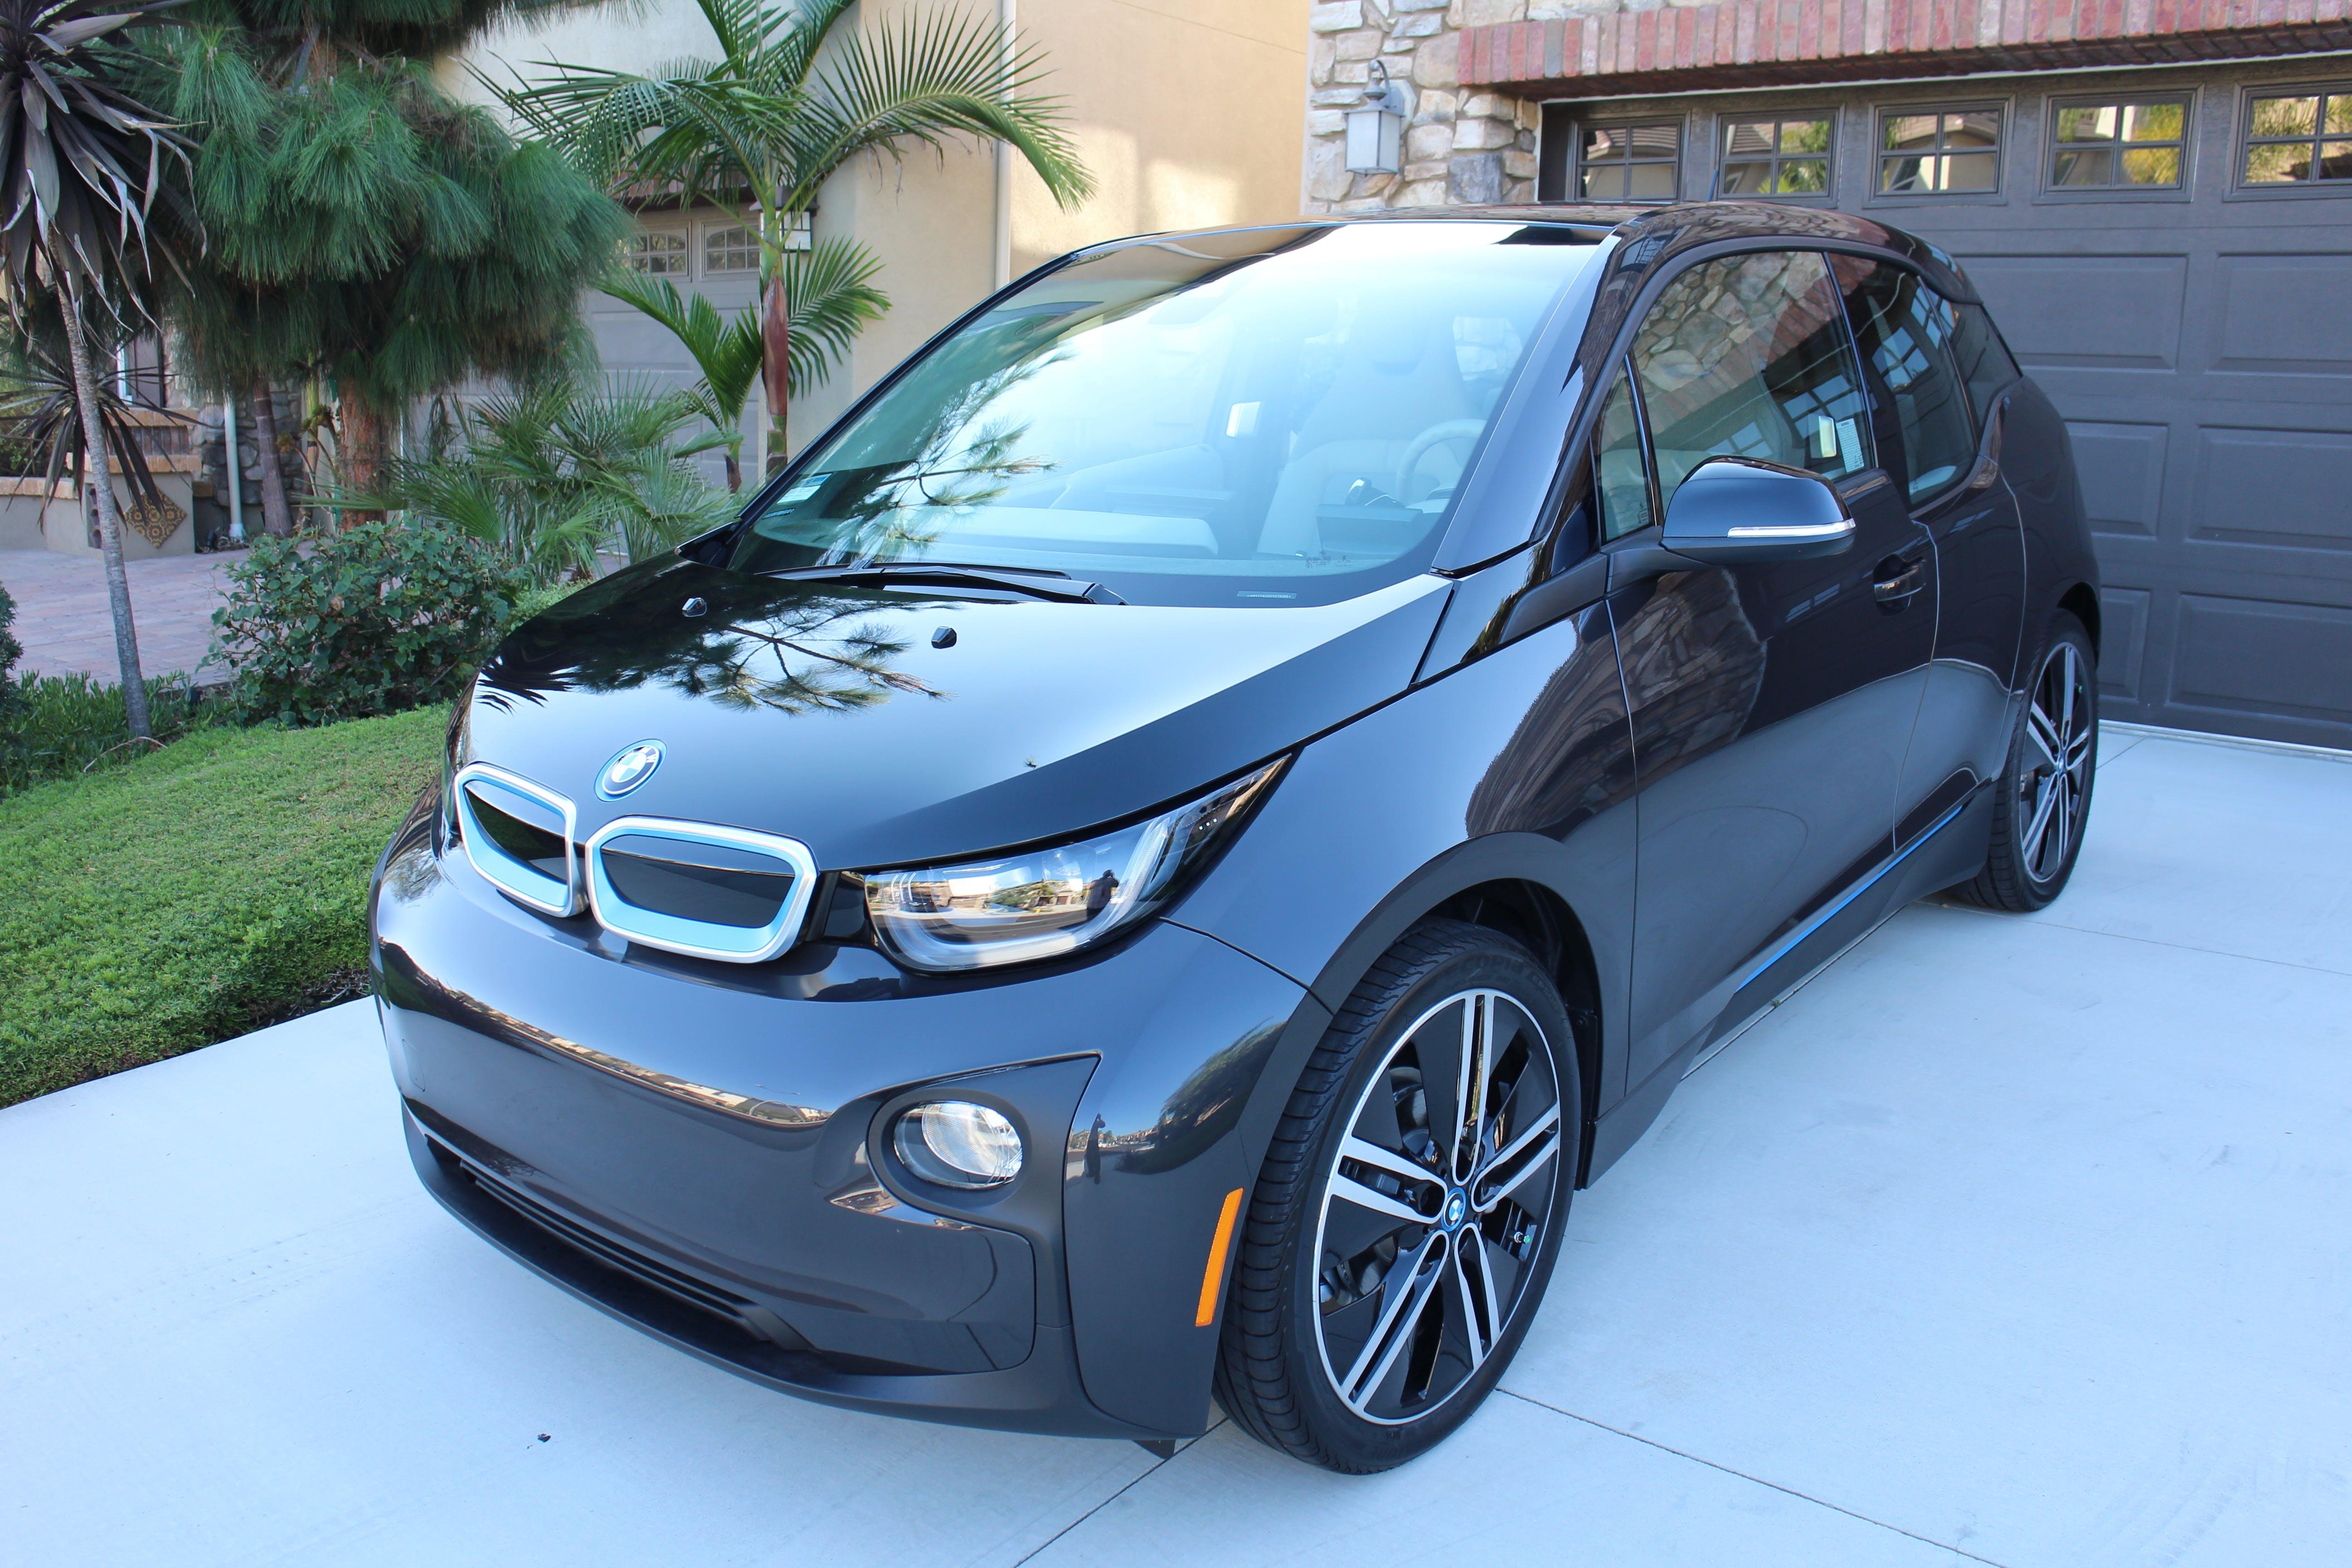 Free stock photo of car, sedan, electric, BMW